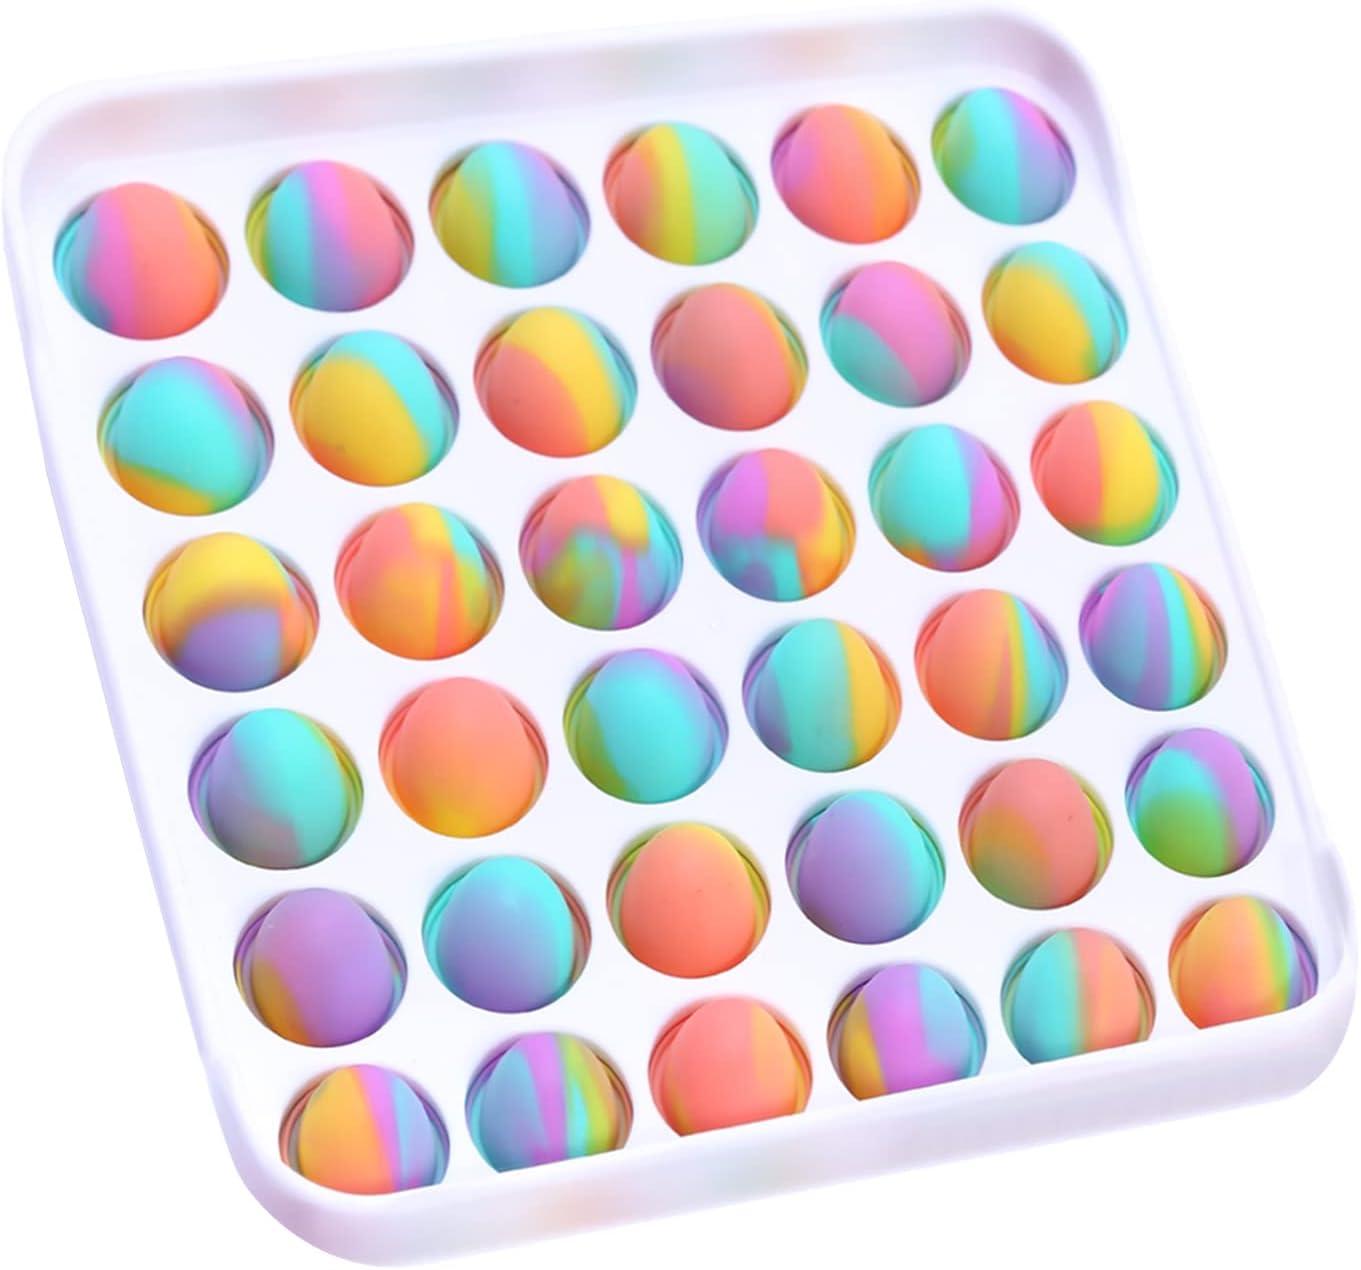 Aneboom PushPop Bubble Fidget Sensory Toy,FidgetToys